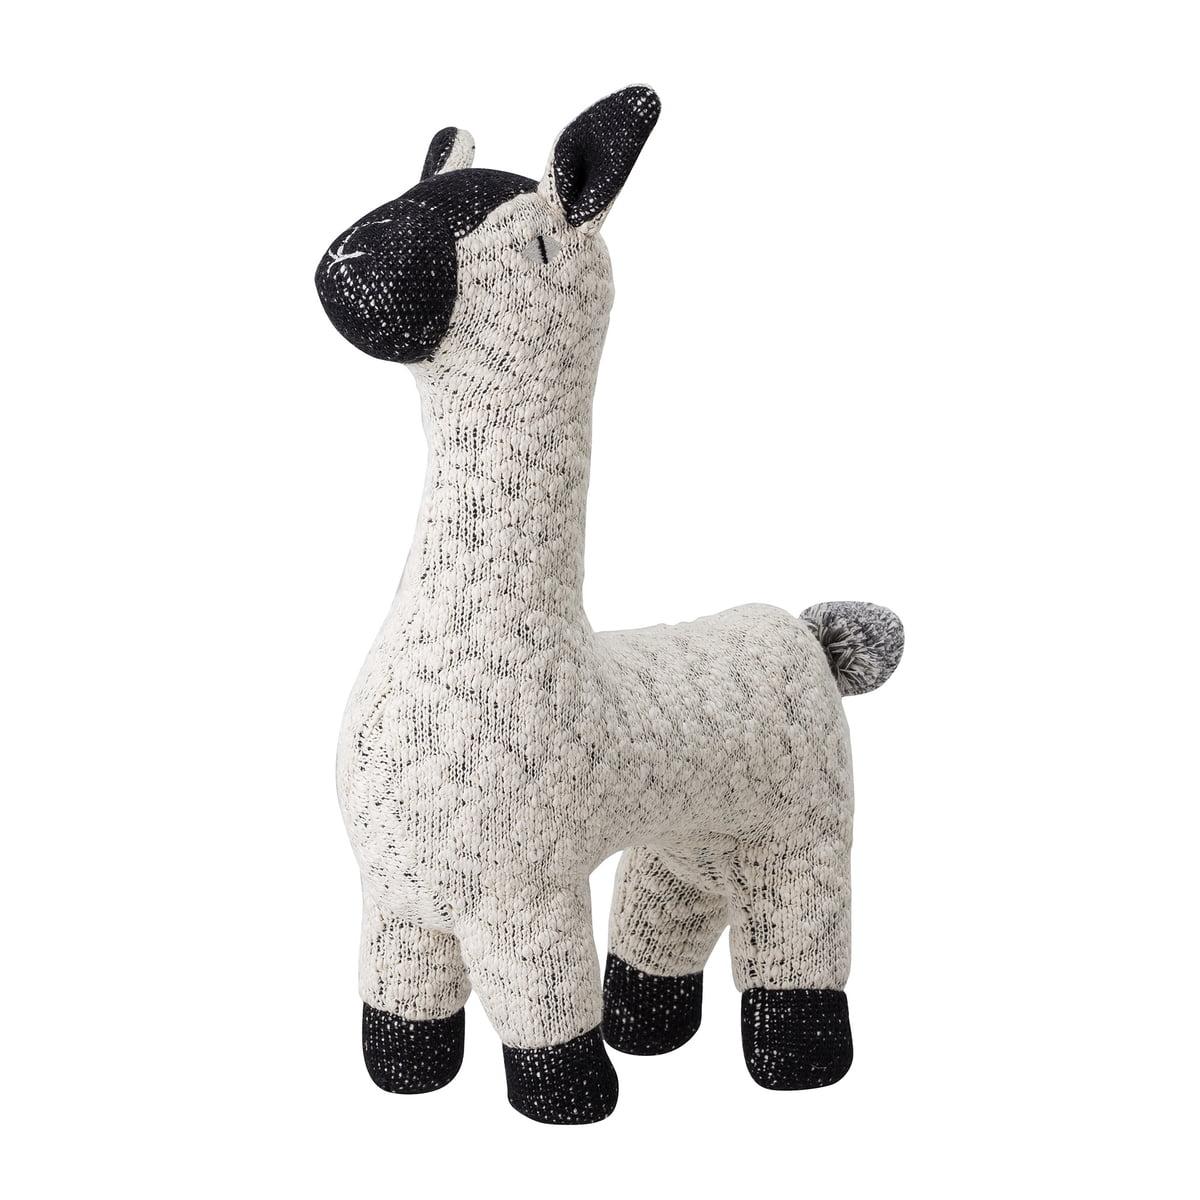 Bloomingville - Cuddly toy alpaca, white / black